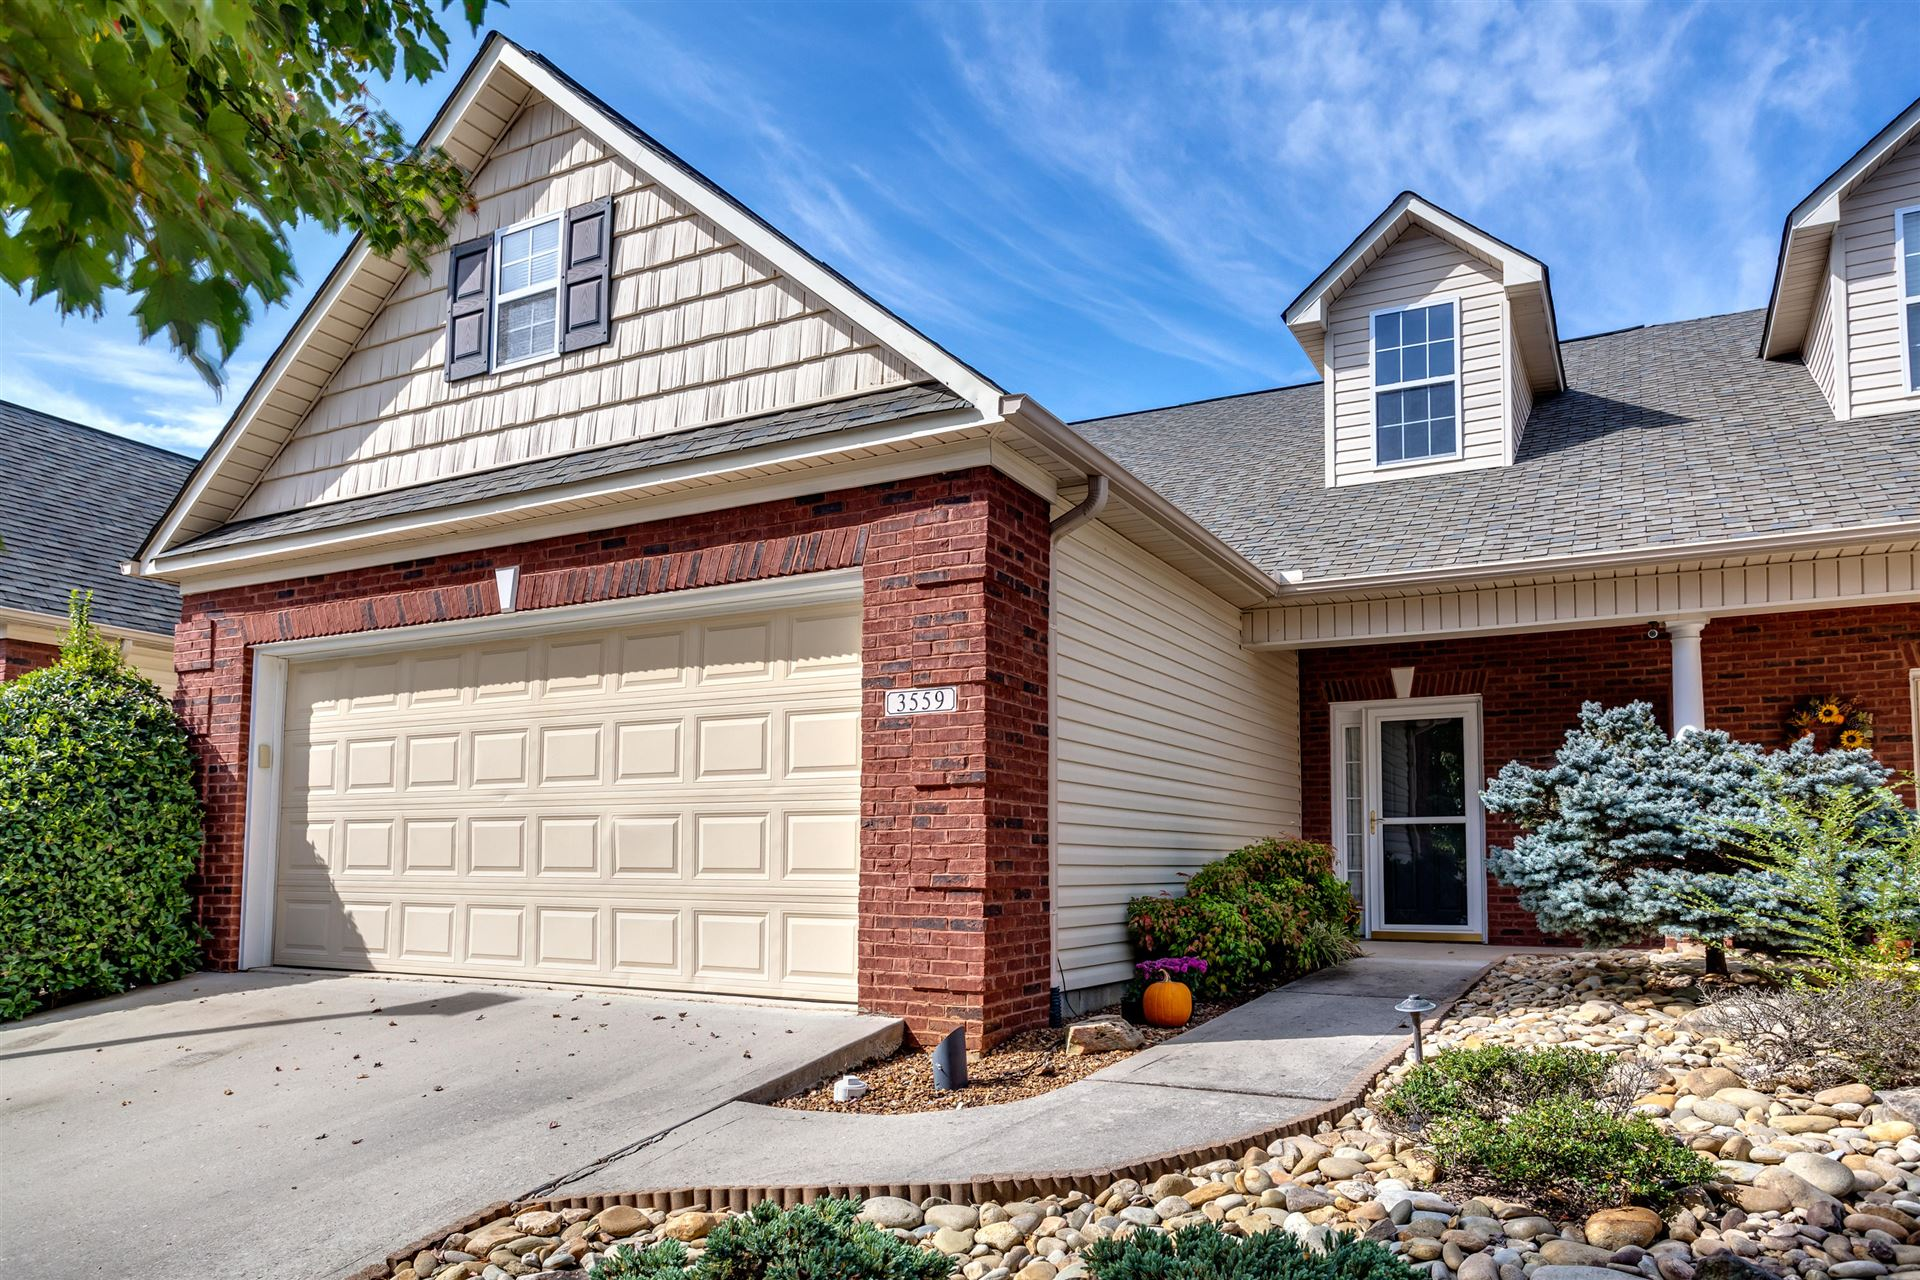 Photo of 3559 Pebblebrook Way, Knoxville, TN 37921 (MLS # 1133396)